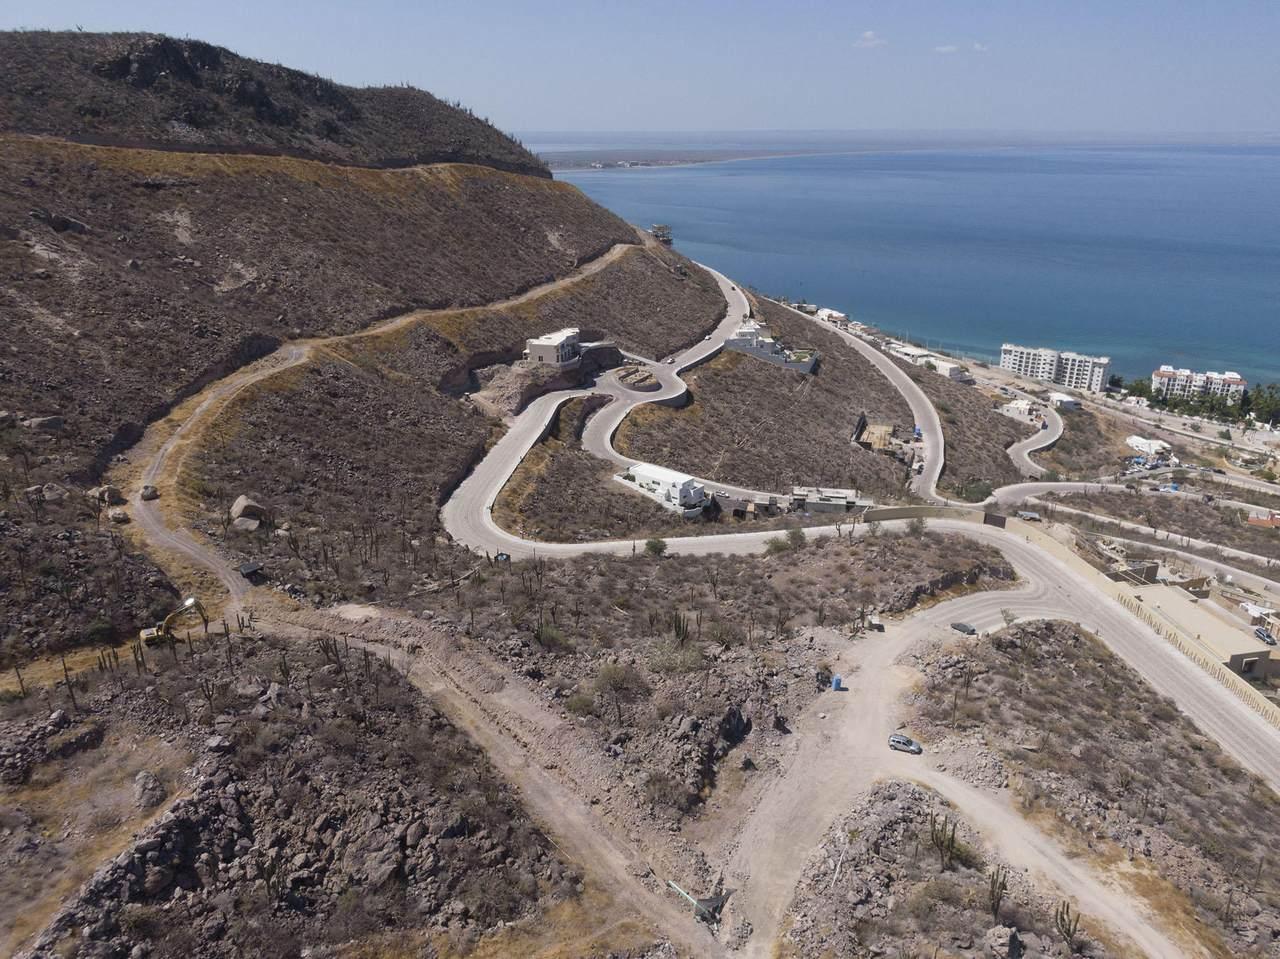 Camino De La Cantera Pedregal La Paz - Photo 1